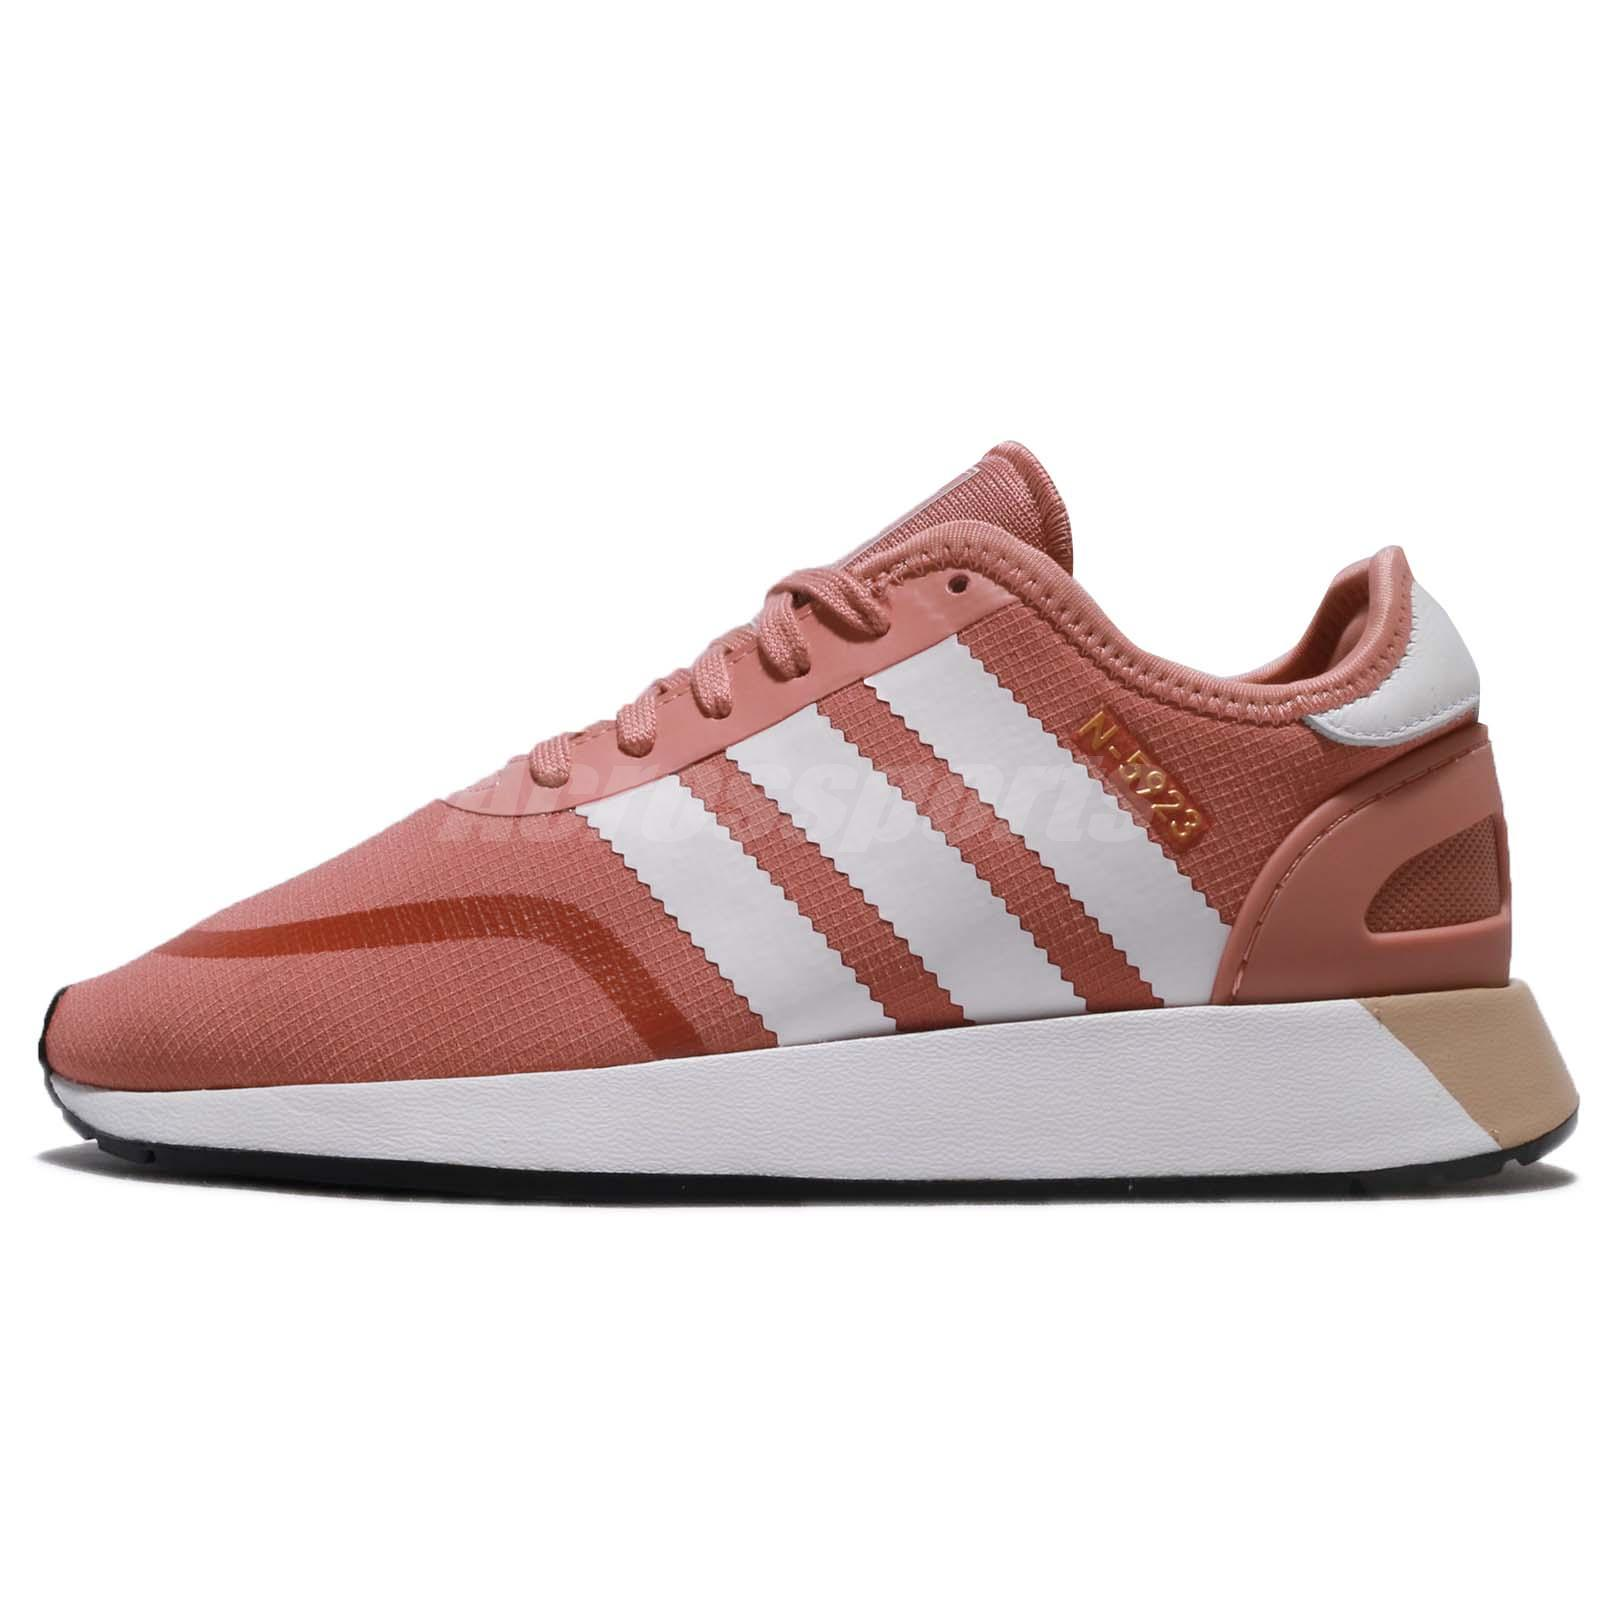 Details about adidas Originals N-5923 W Iniki Runner Ash Pink White Women  Casual Shoes AQ0267 c9d02b6bb1